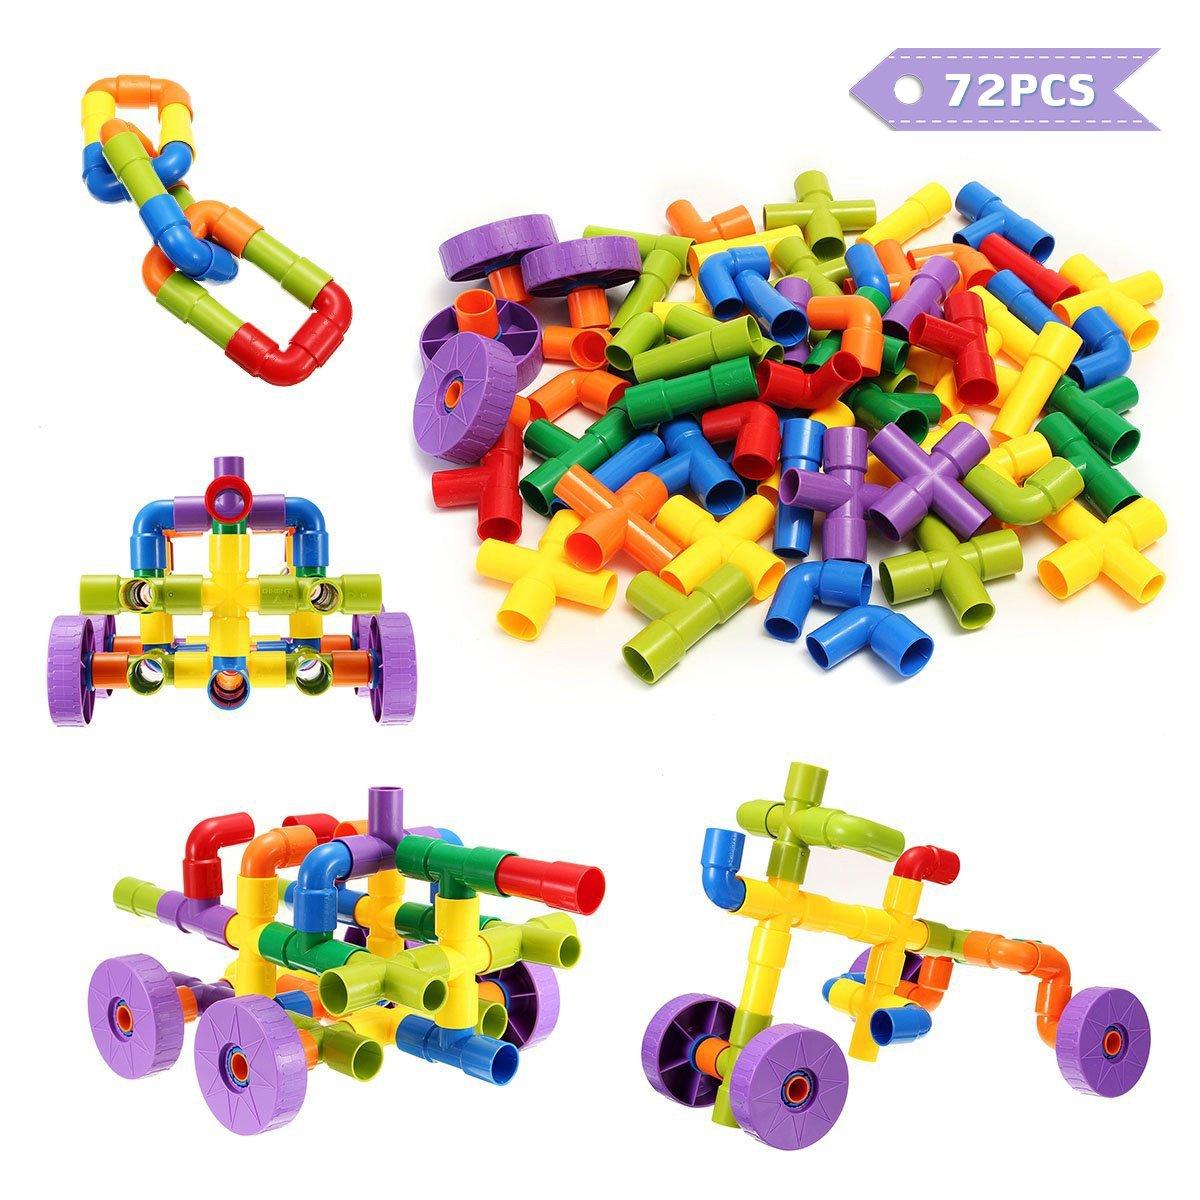 FUNTOK Building Blocks, Tube Blocks Set Assembling Toys DIY Pipeline Blocks with Wheels 72 pcs Interlocking Set Construction Building Blocks for Kids